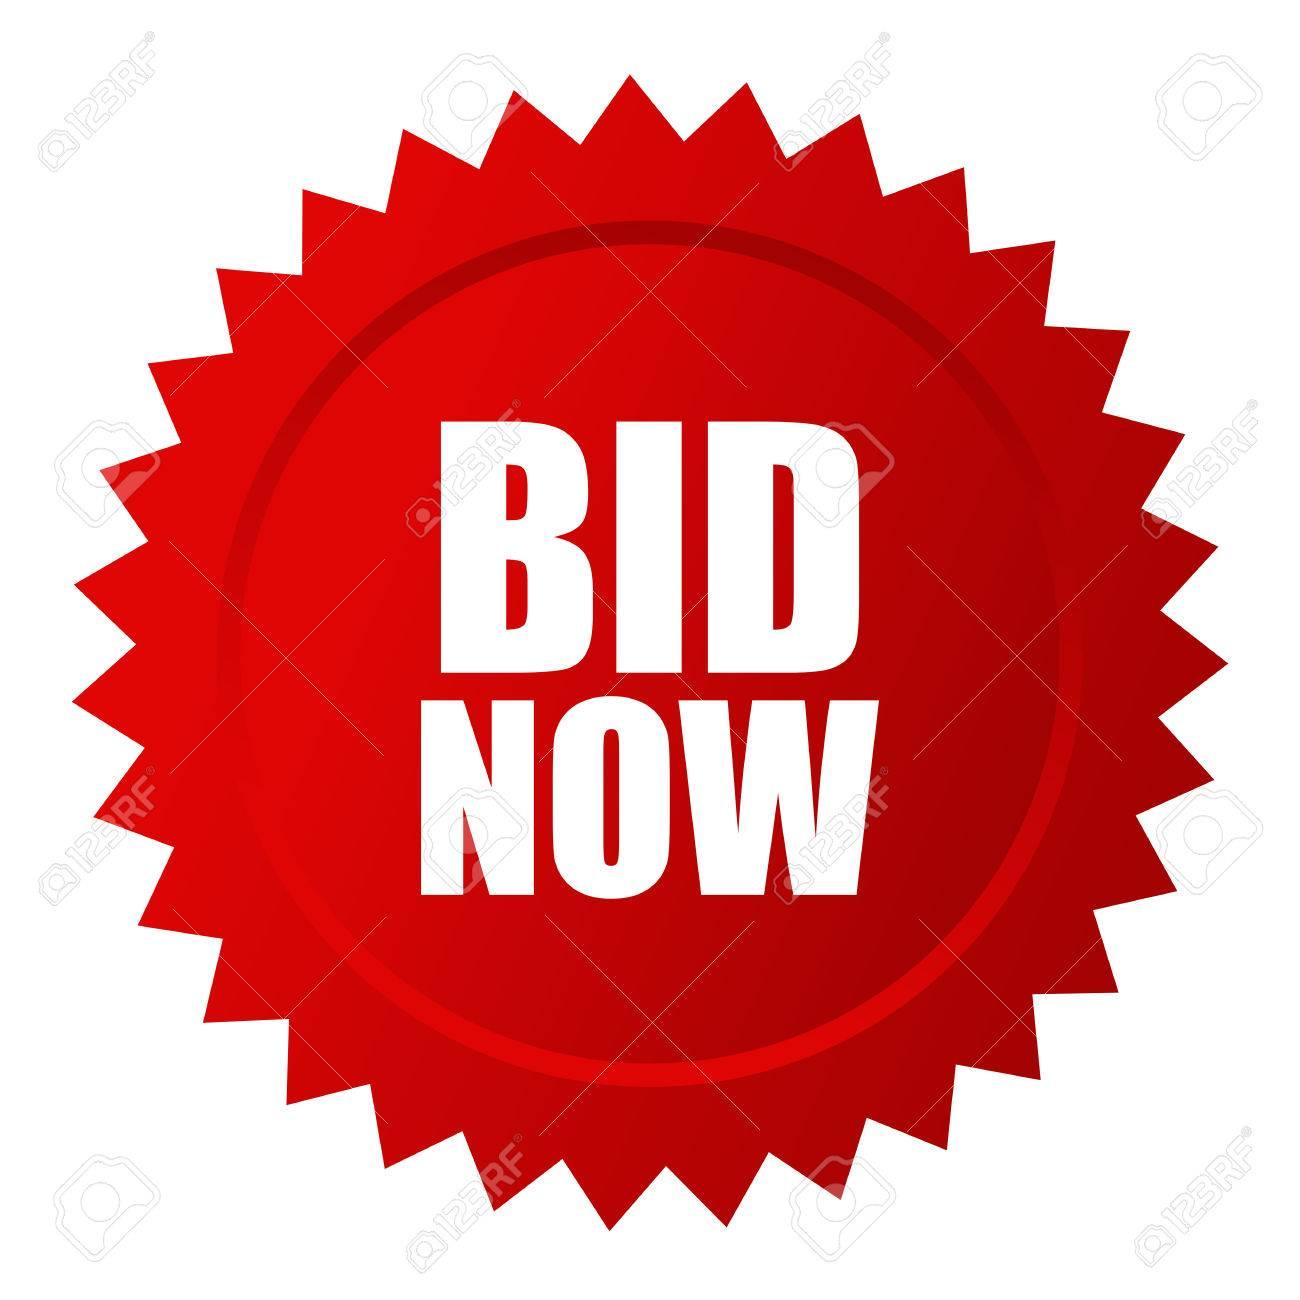 Bid now auction star icon - 64138412